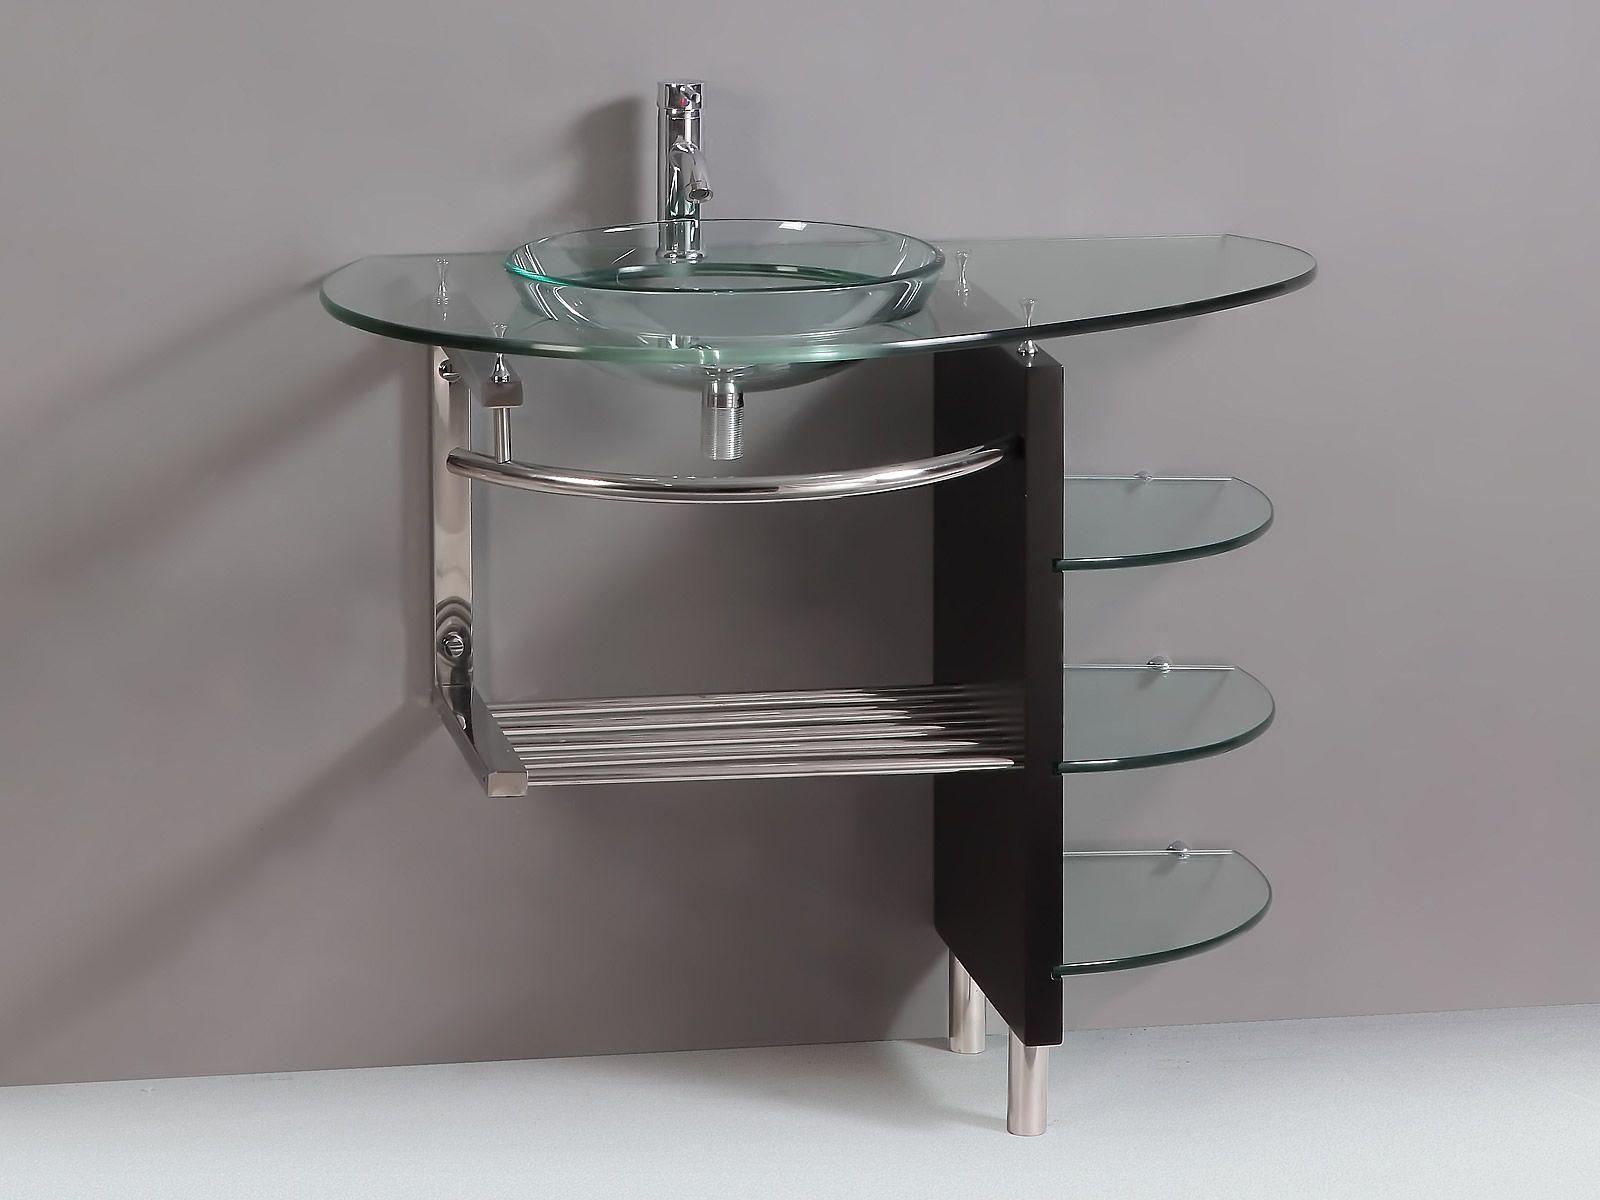 Glass Pedestal Sinks 39 4 Inch Complete Modern Glass Bathroom